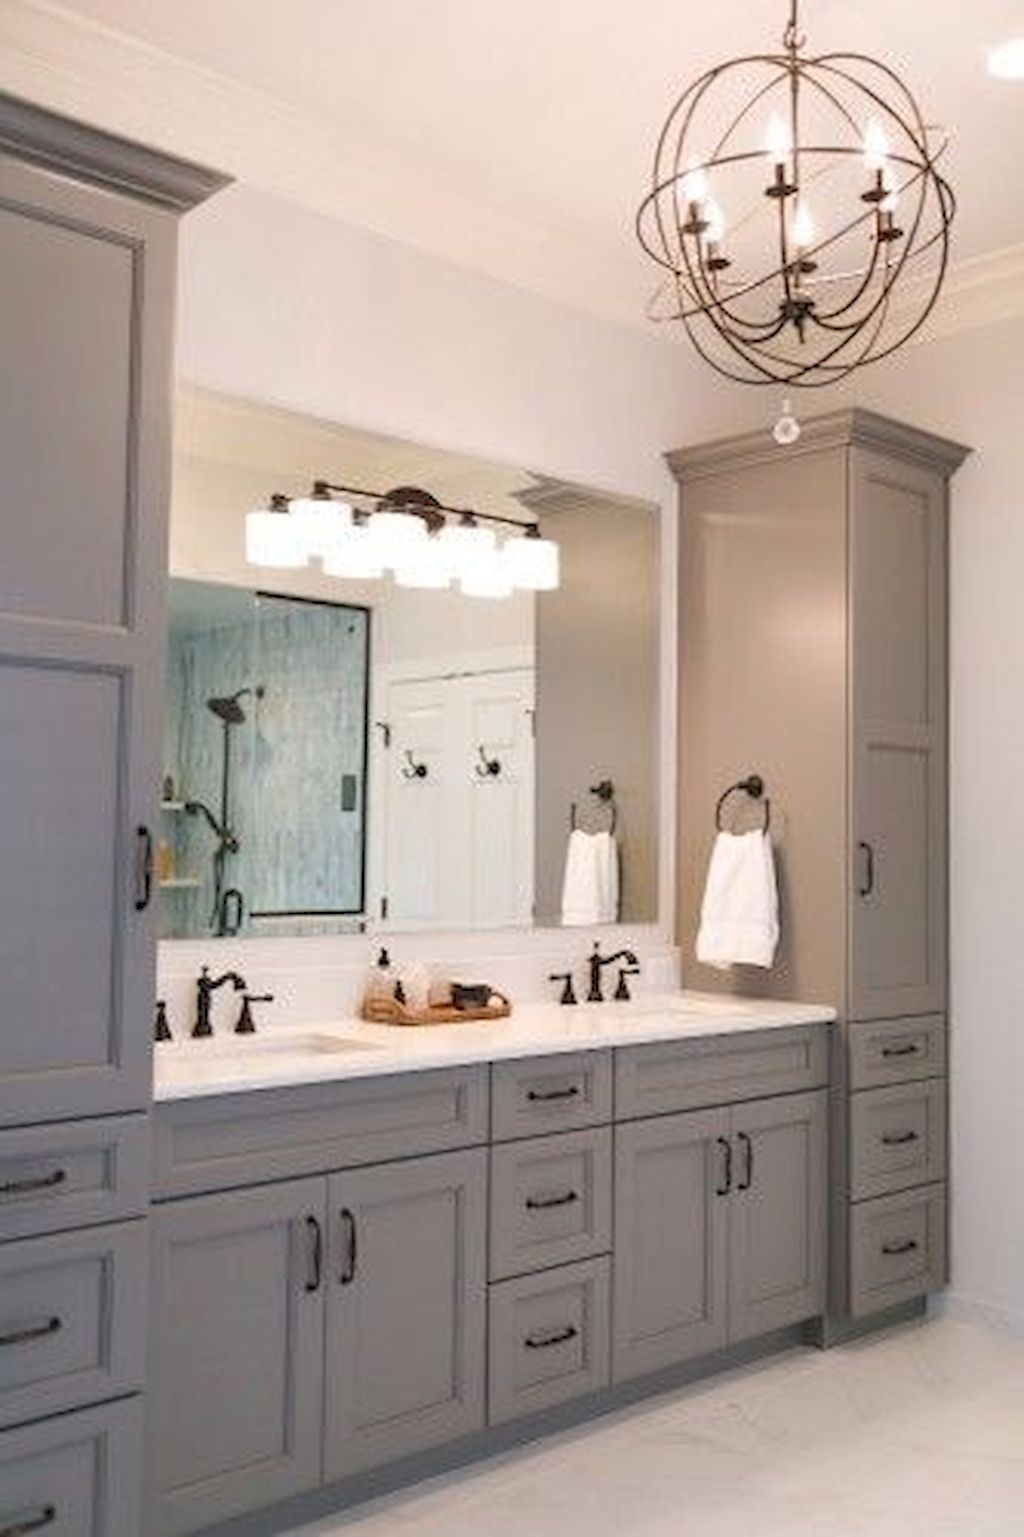 53 Farmhouse Rustic Master Bathroom Remodel Ideas Bathroom Vanity Remodel Bathroom Vanity Designs Bathroom Remodel Master